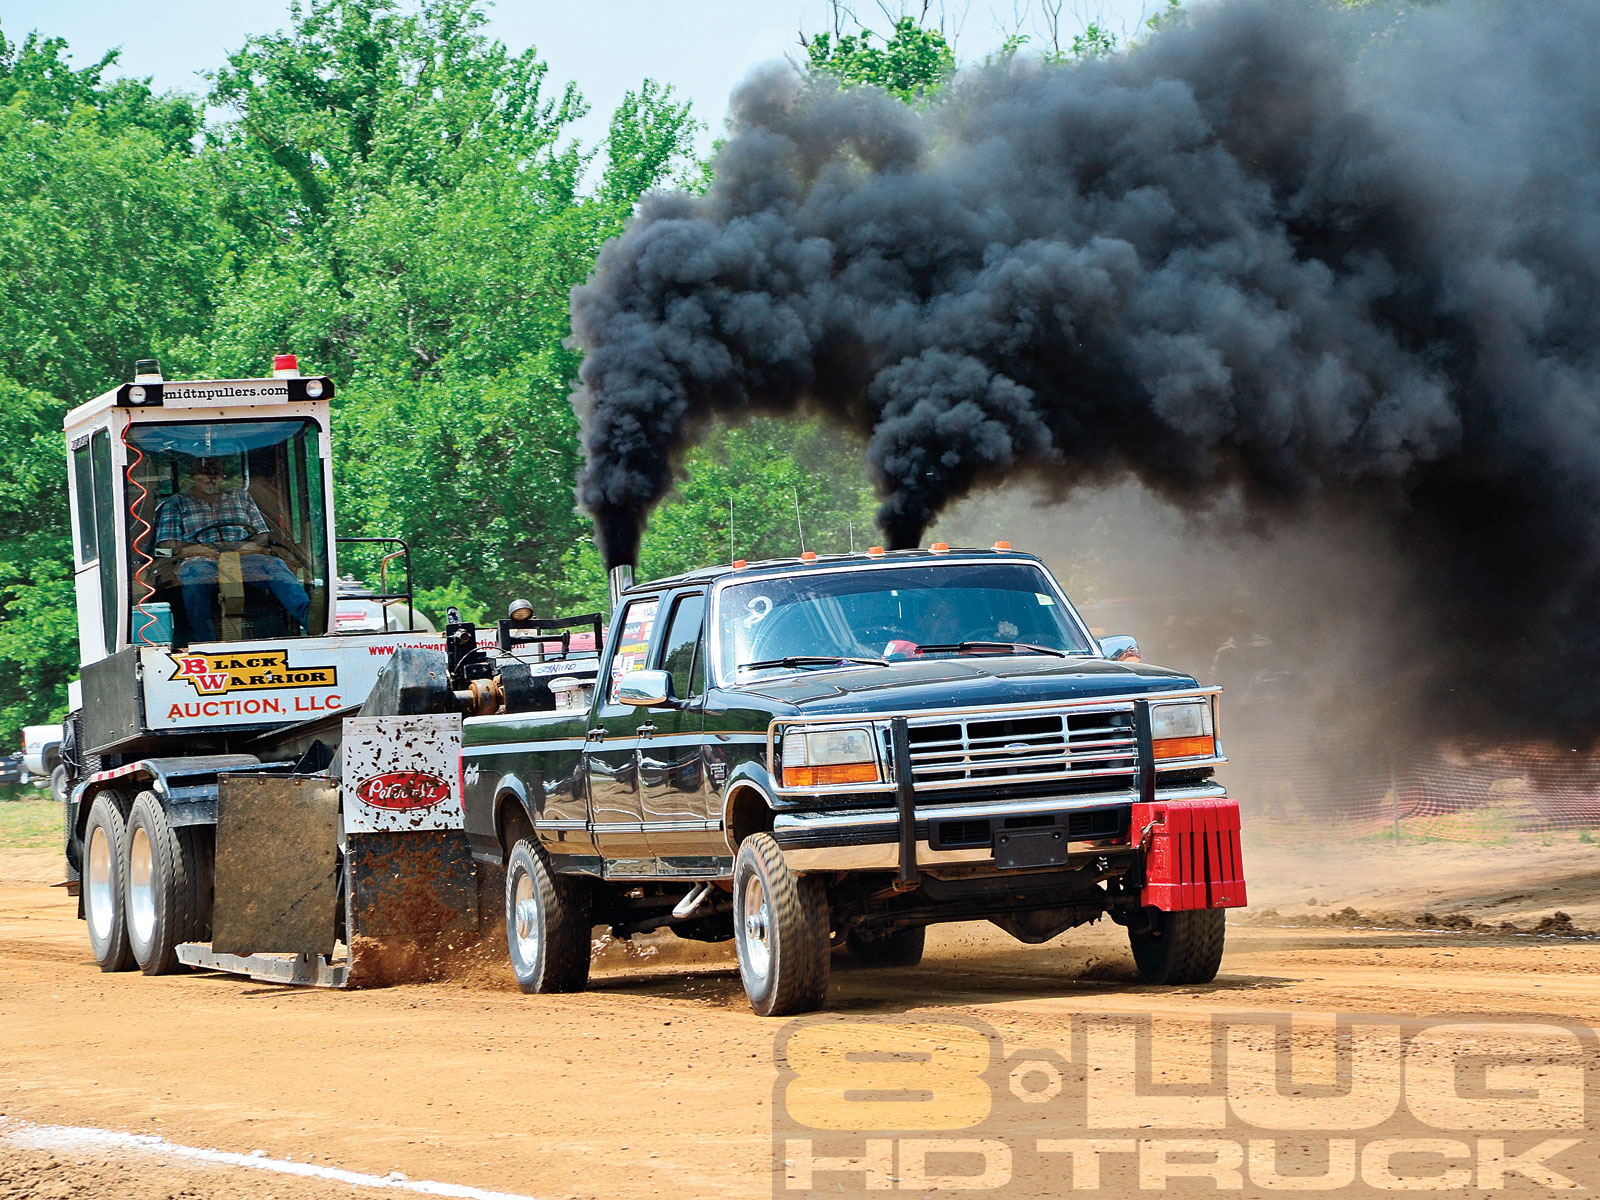 Ford Powerstroke Wallpaper >> Diesel Truck Wallpaper - WallpaperSafari